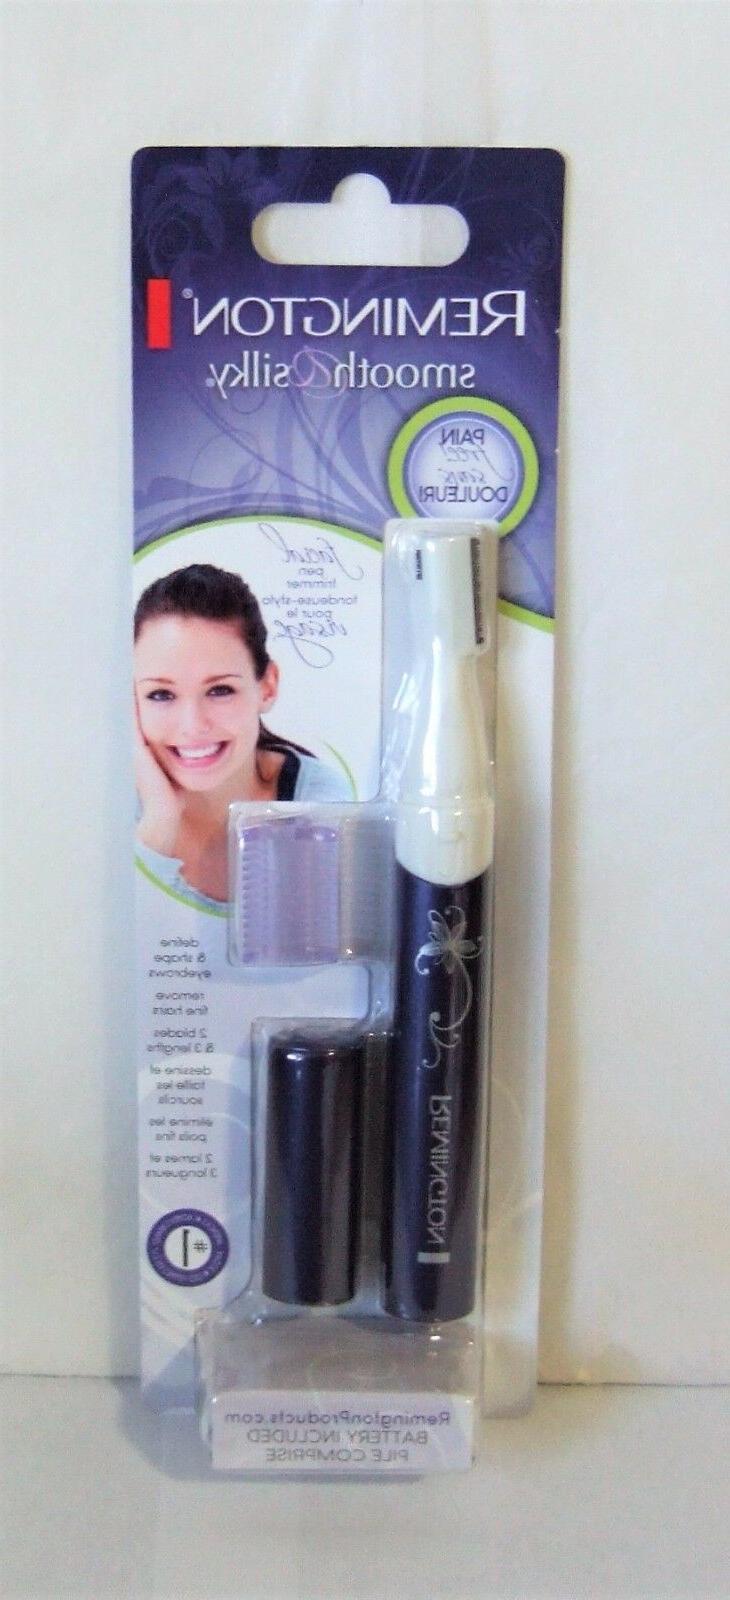 mpt3500 dual blade facial trimmer